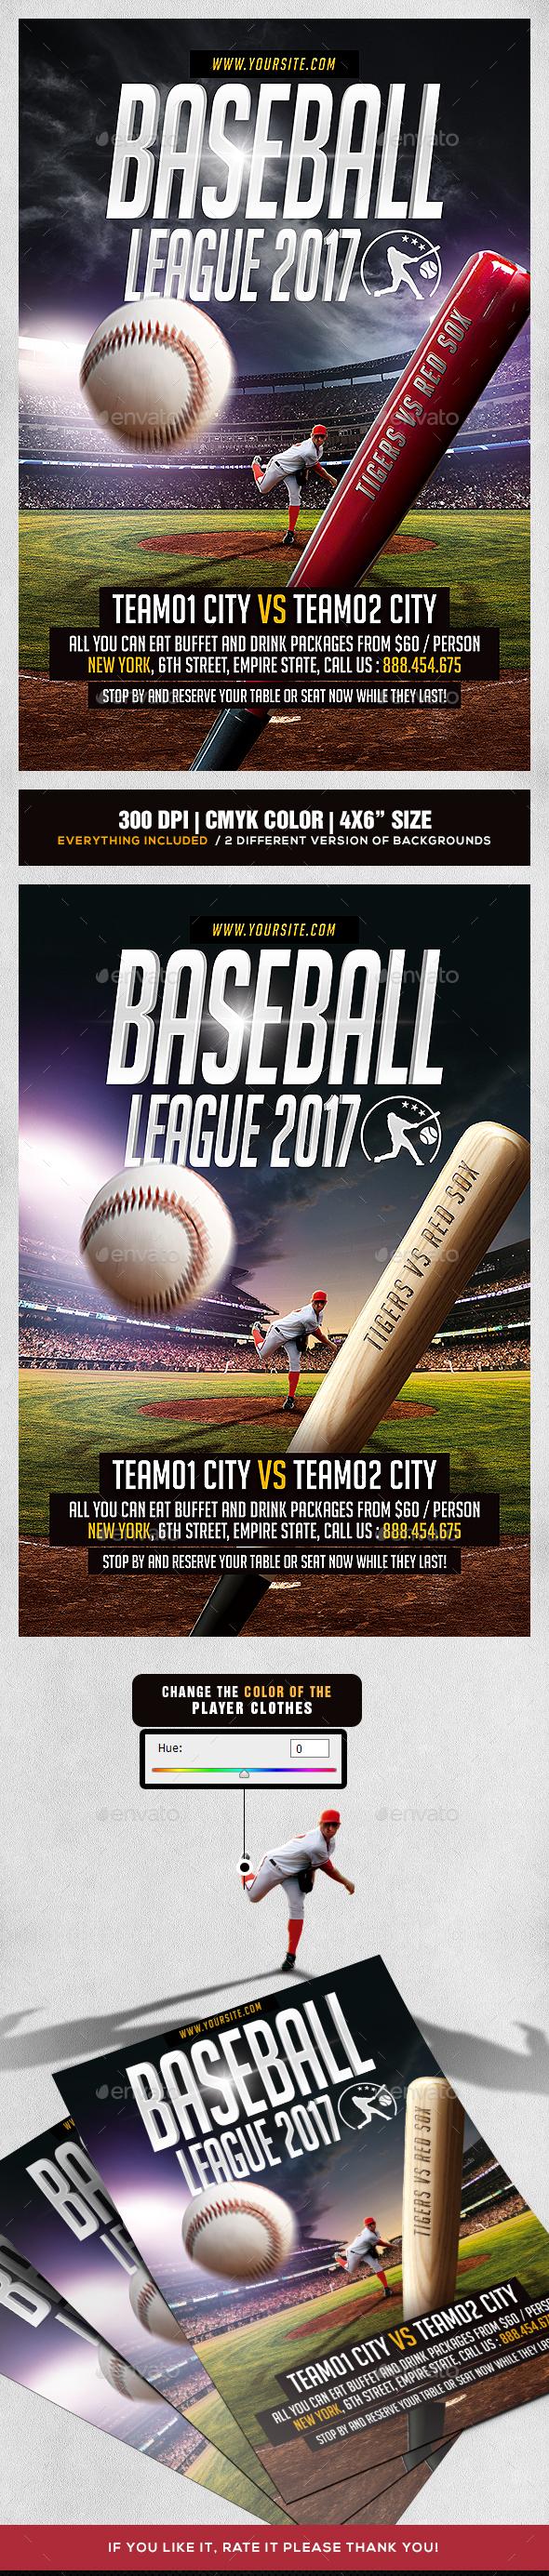 Baseball League Flyer - Sports Events